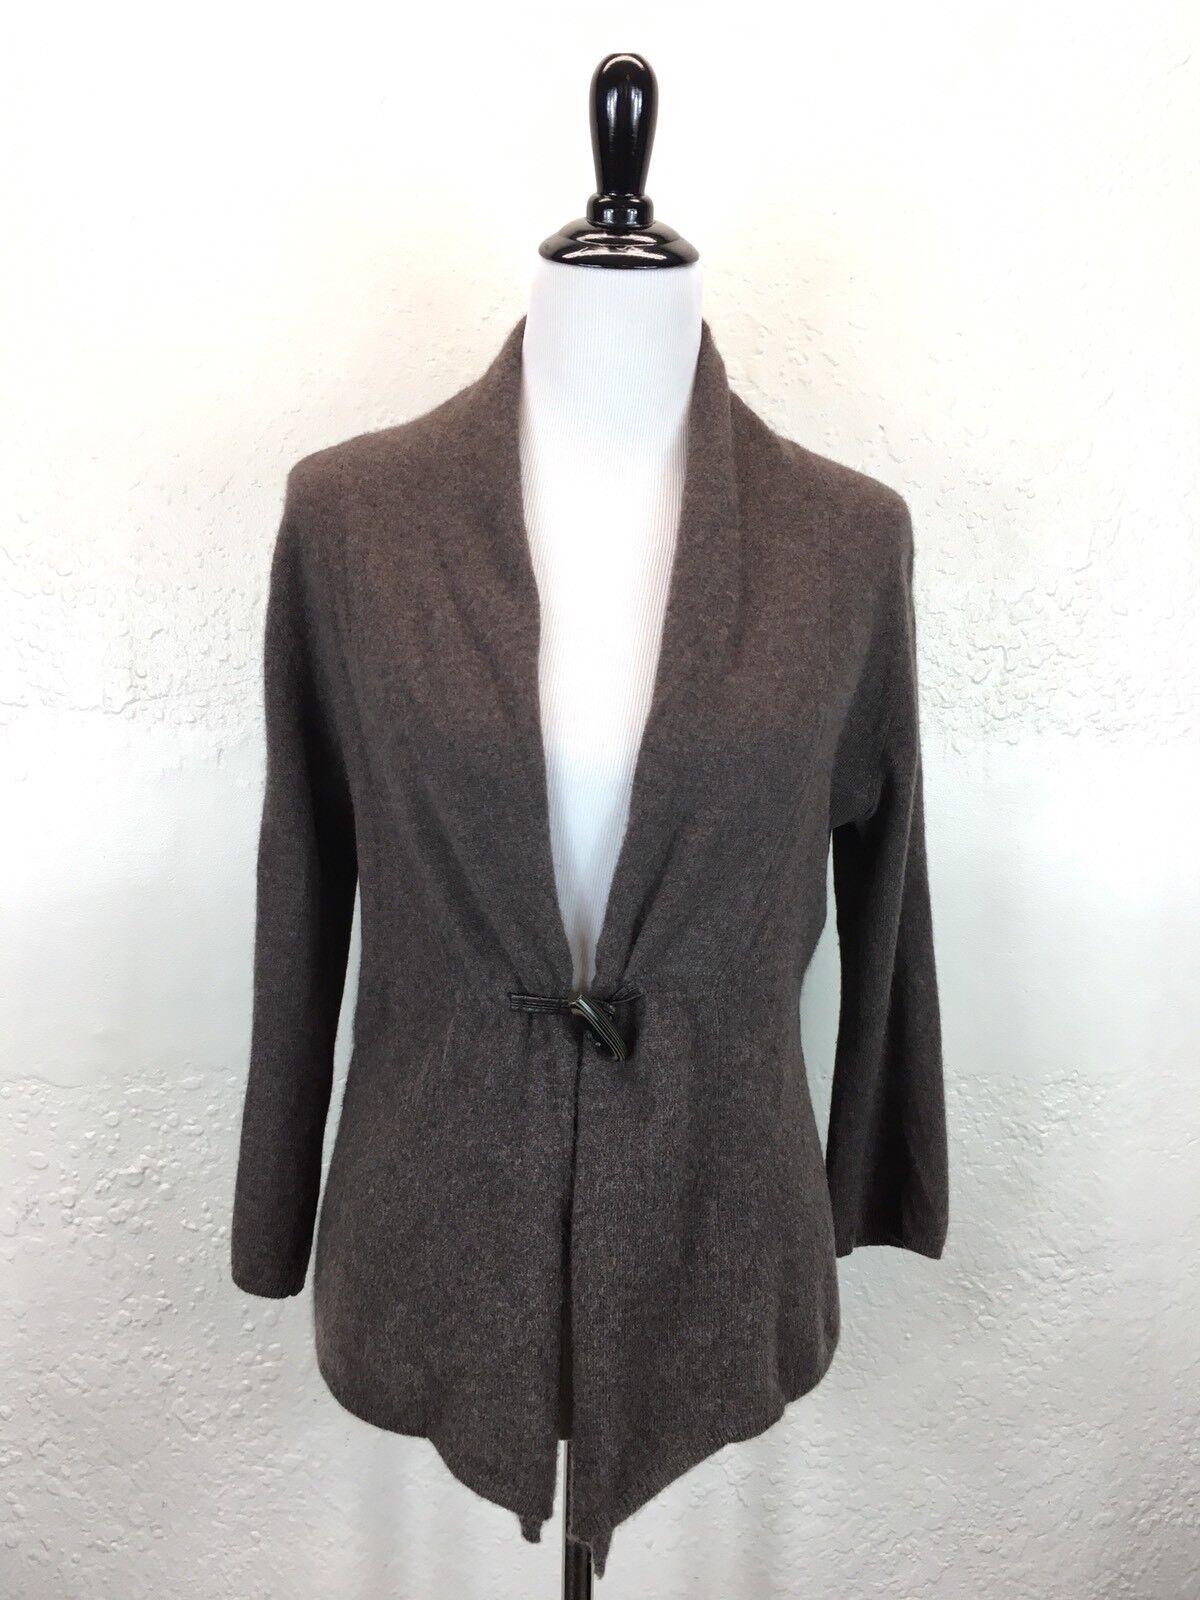 S13 Fenn Wright Manson Sz M 100% Cashmere Brown Toggle Cardigan Sweater 3 4